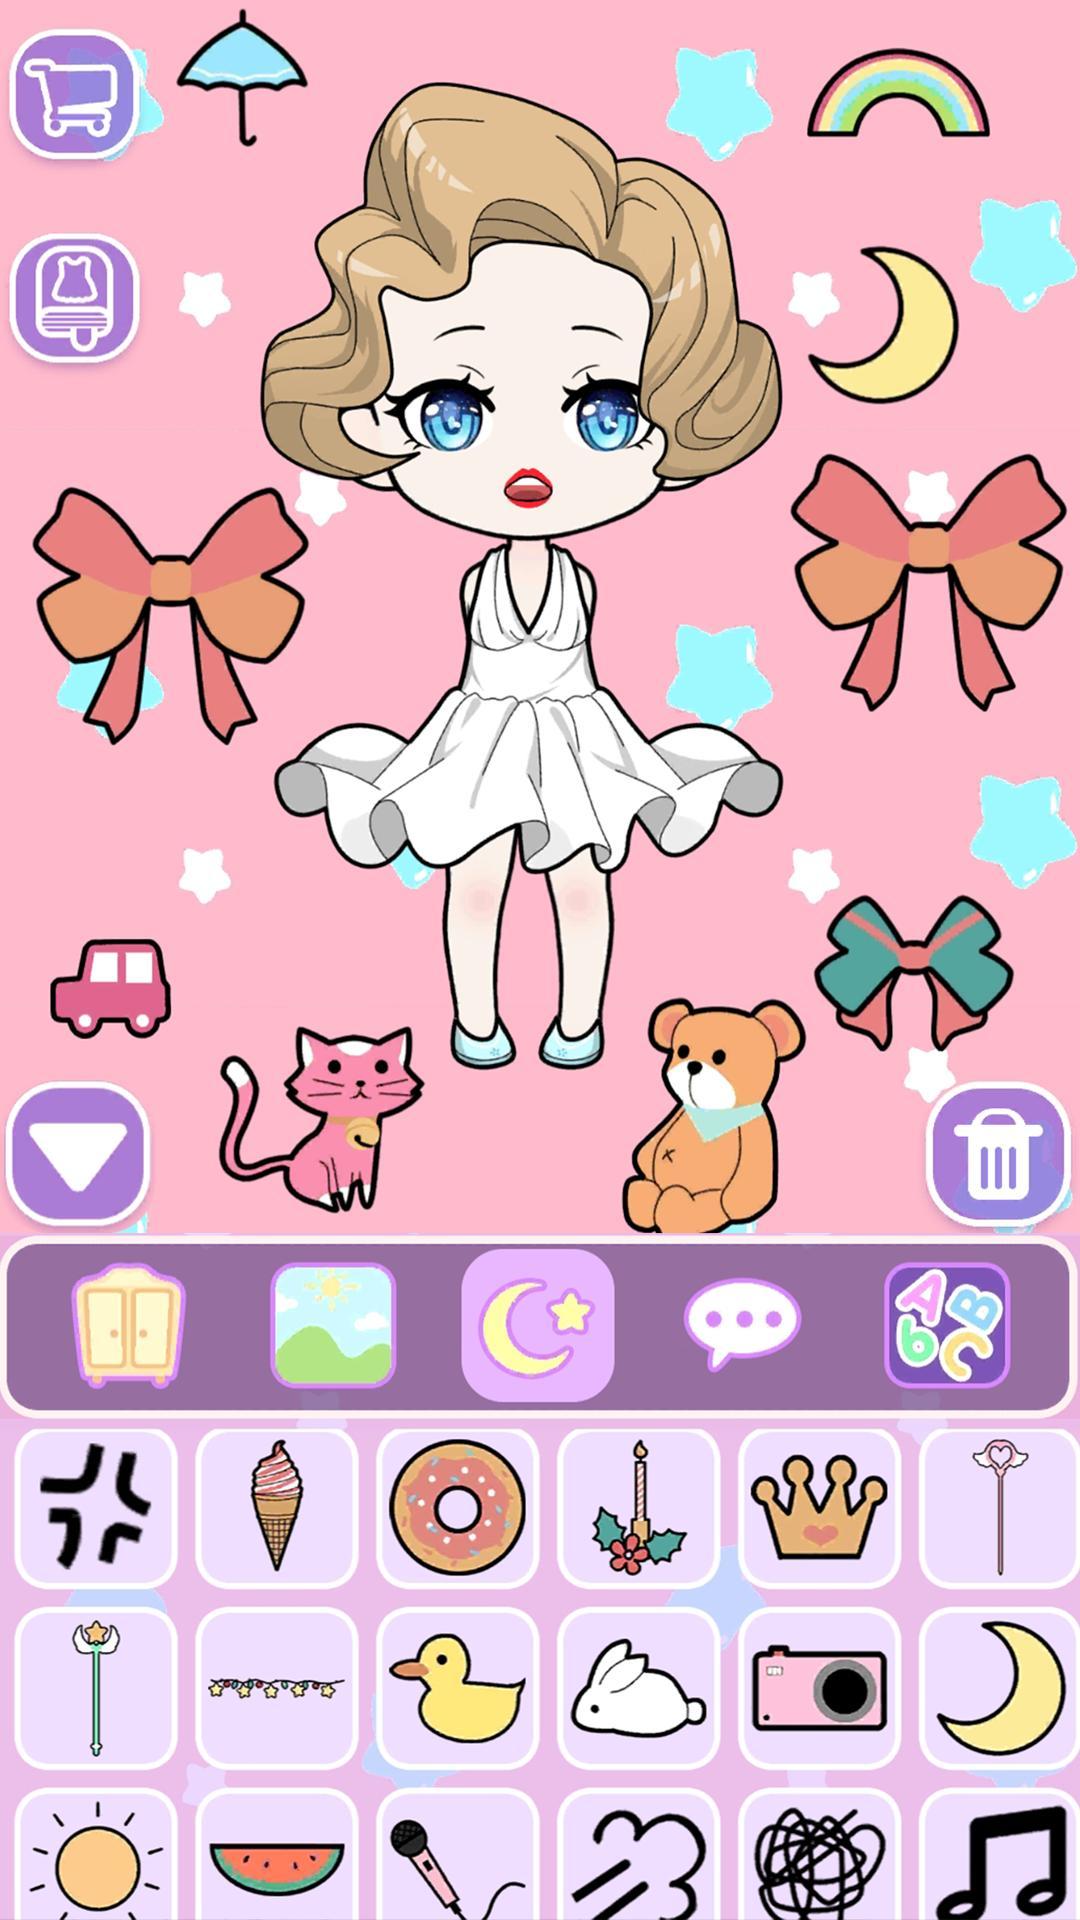 Vlinder Doll Dress up Games , Avatar Creator 1.2.1 Screenshot 1